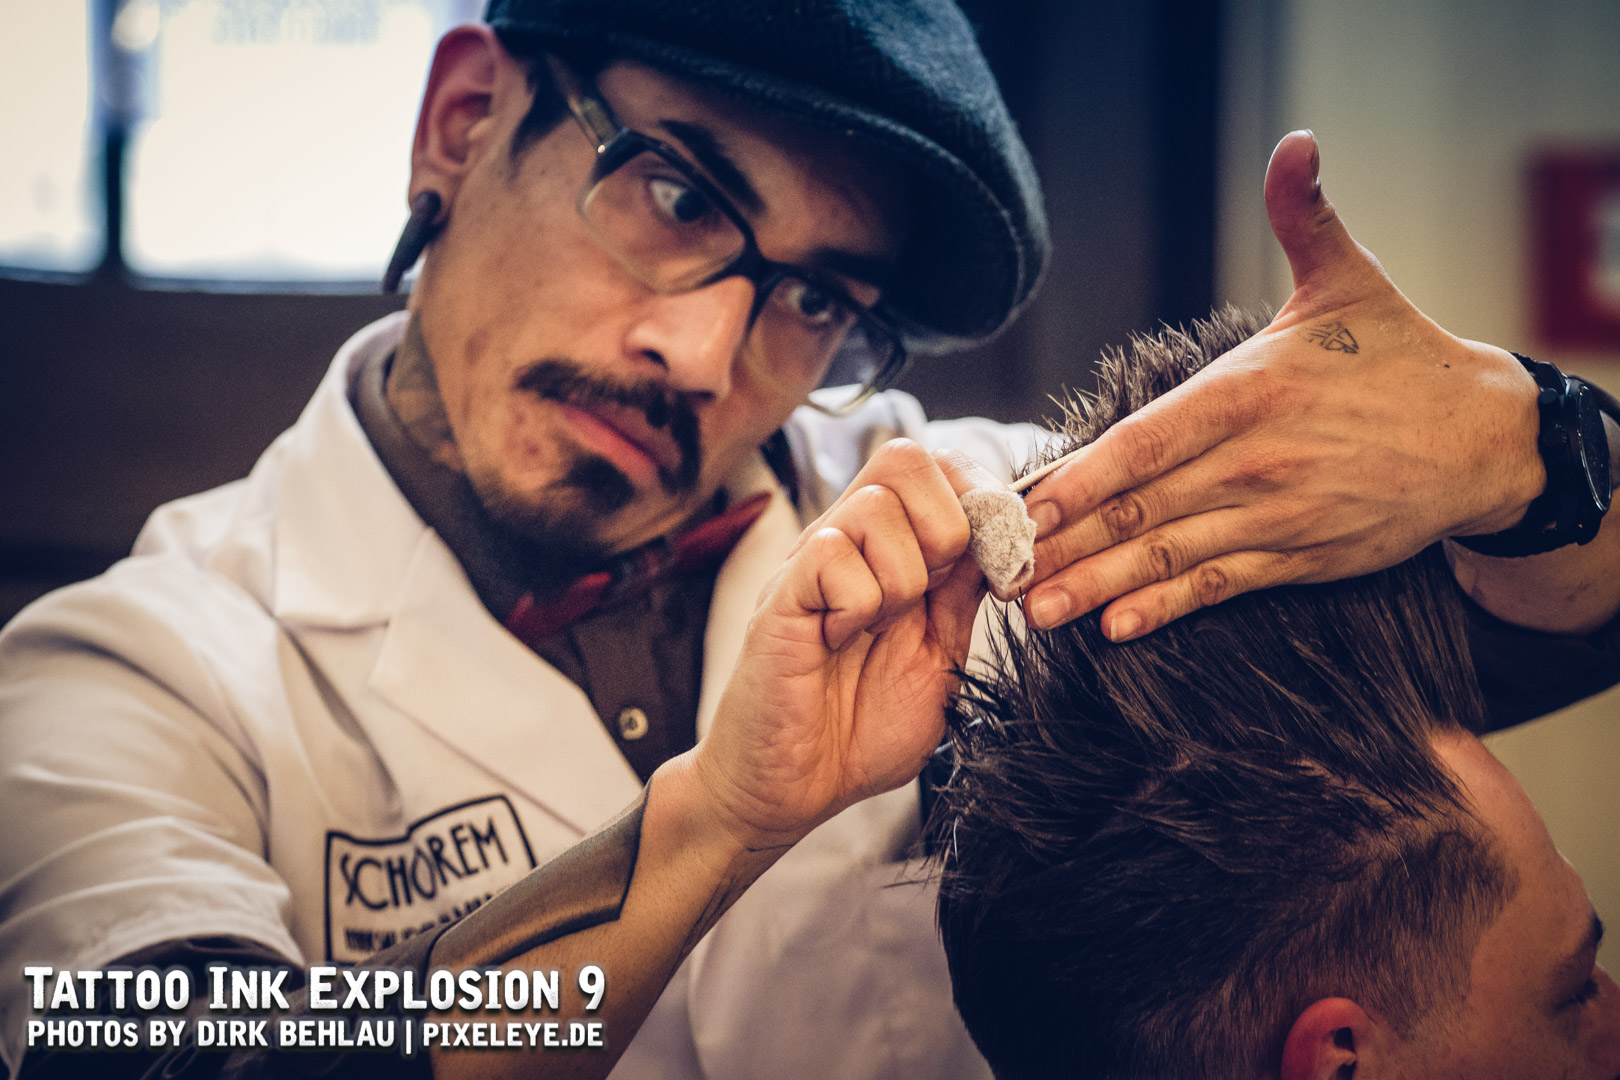 Tattoo Ink Explosion 2018 WEB by Dirk Behlau-1295.jpg